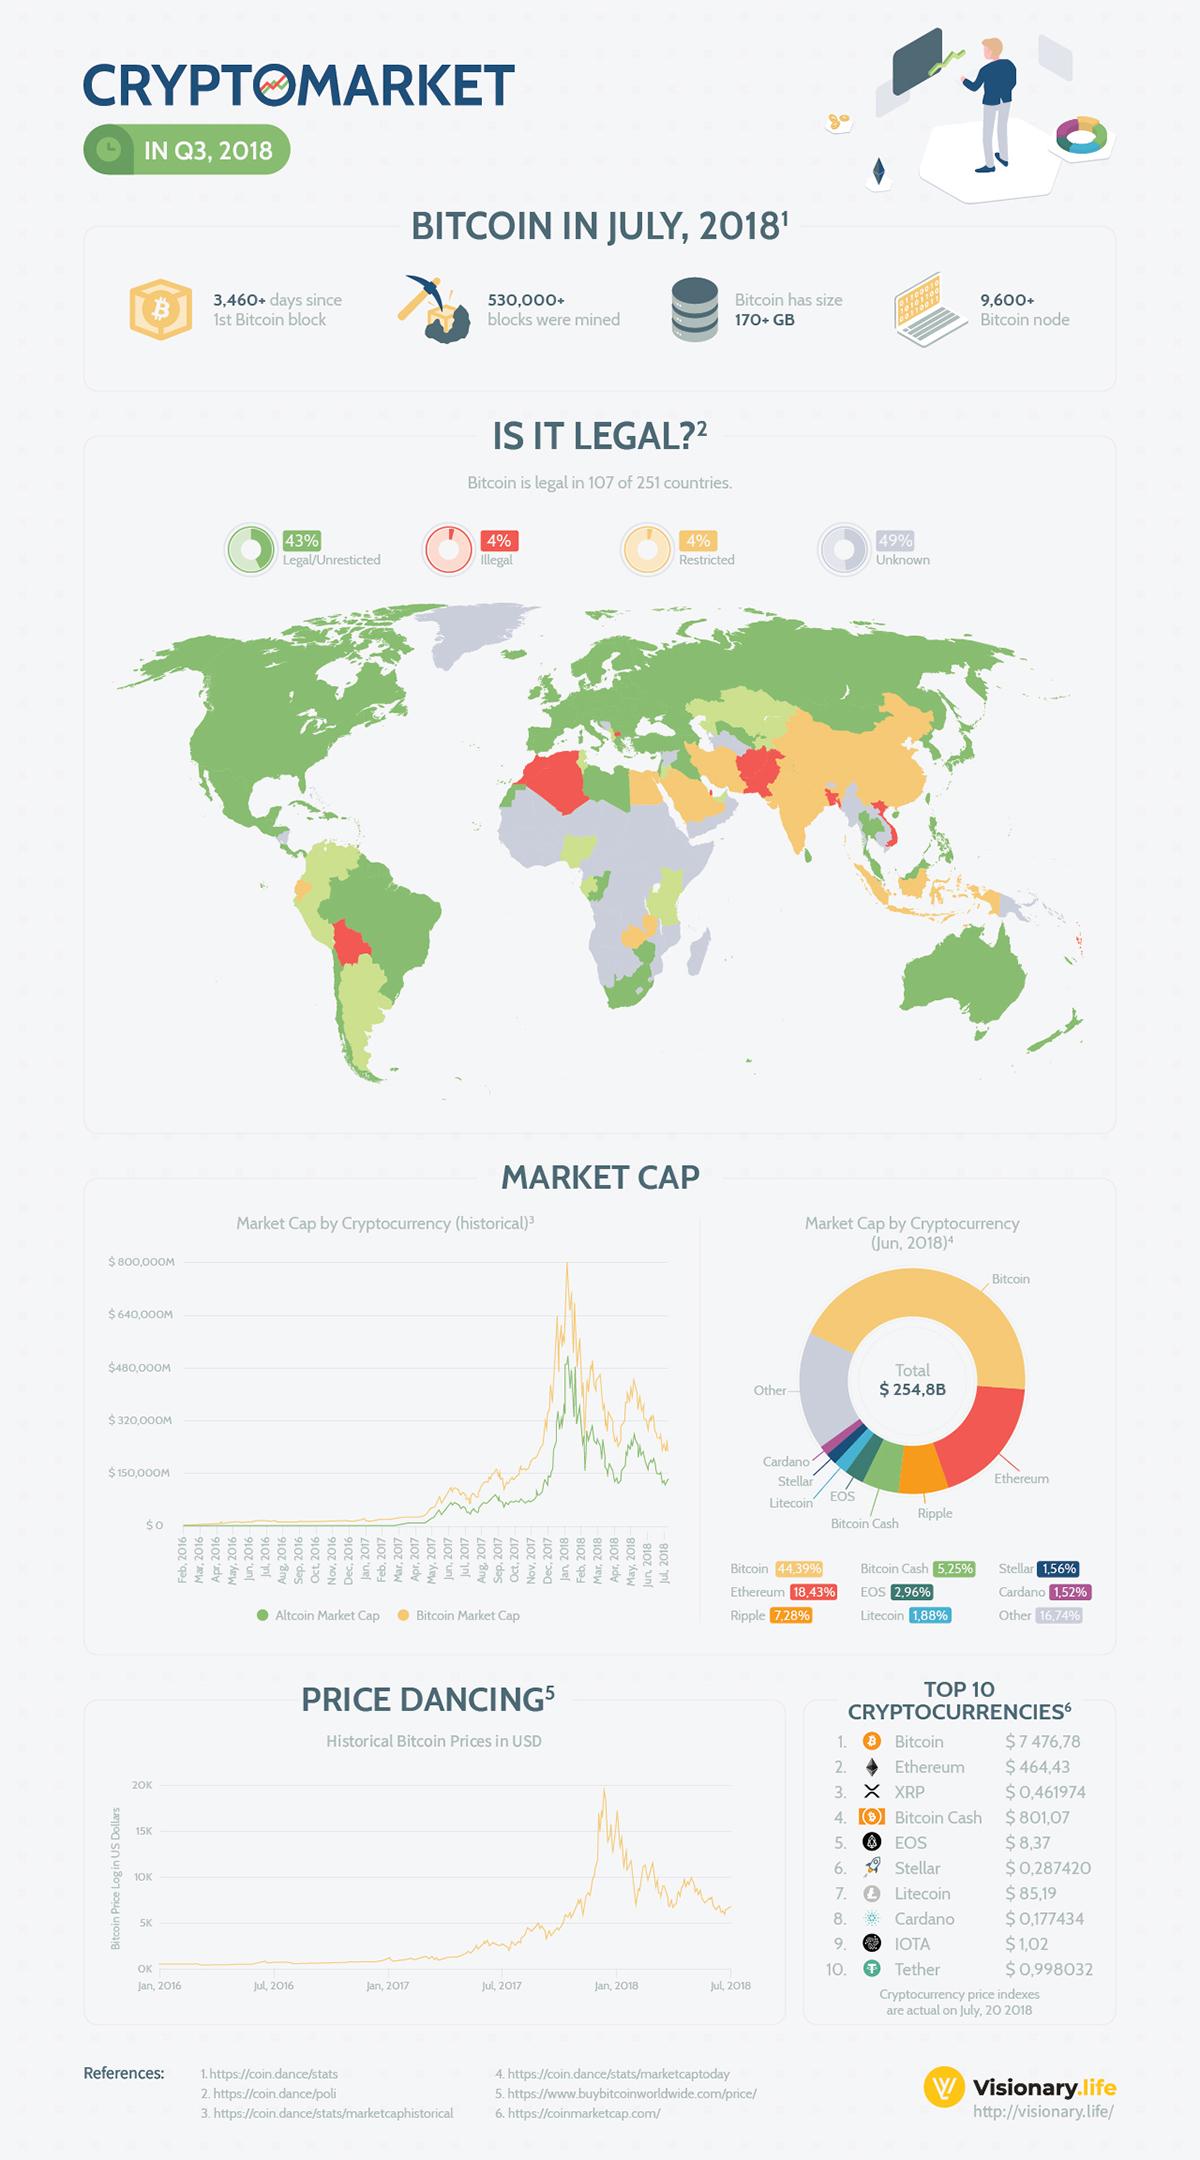 Cryptomarket in Q3, 2018